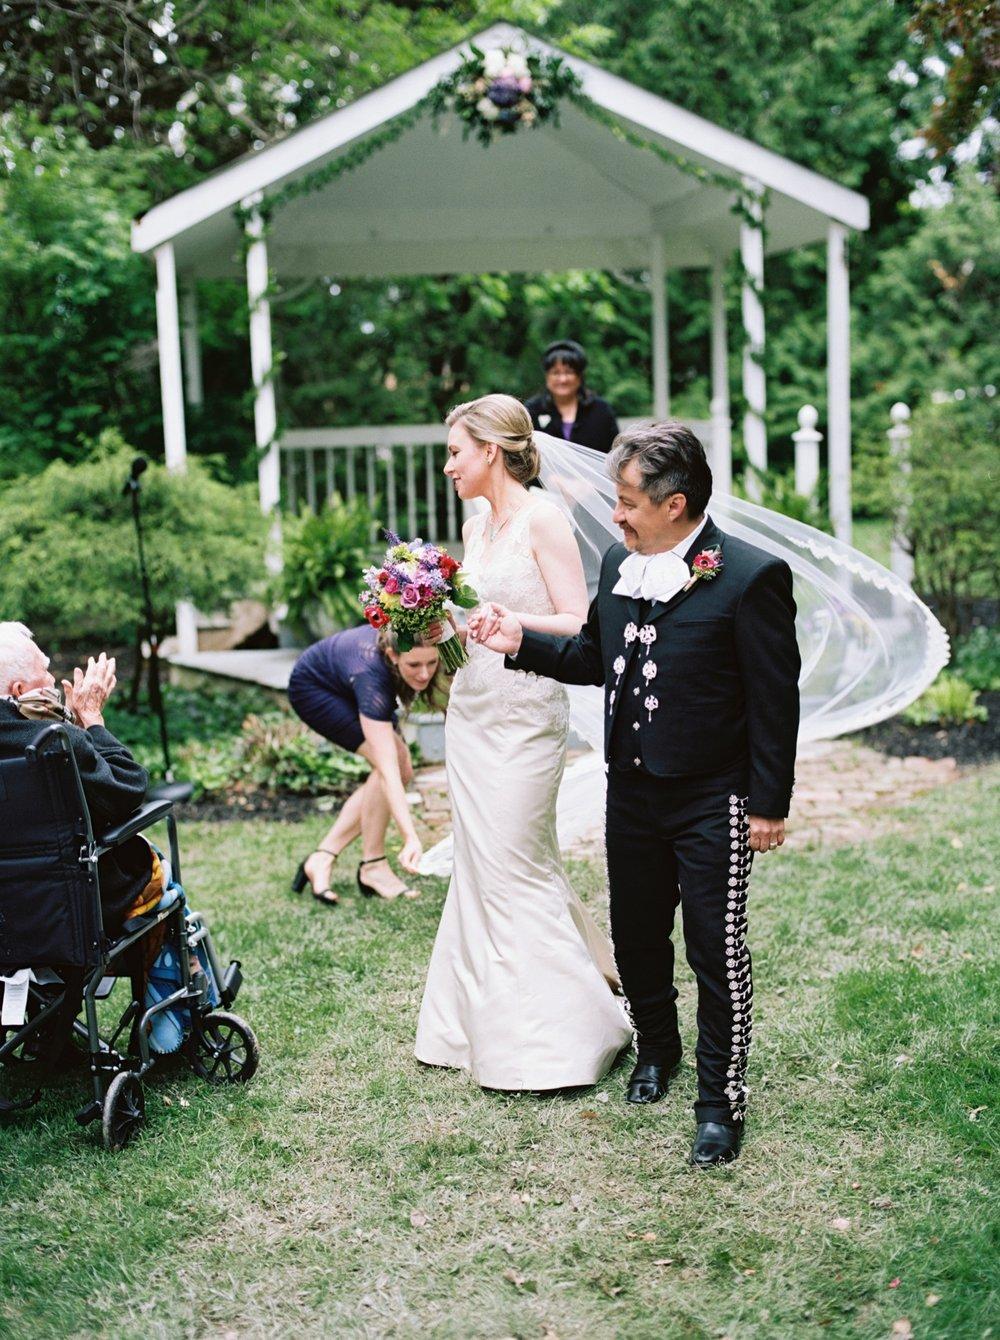 season magnolia manor wedding elisa ignacio czar goss photo 17.jpg